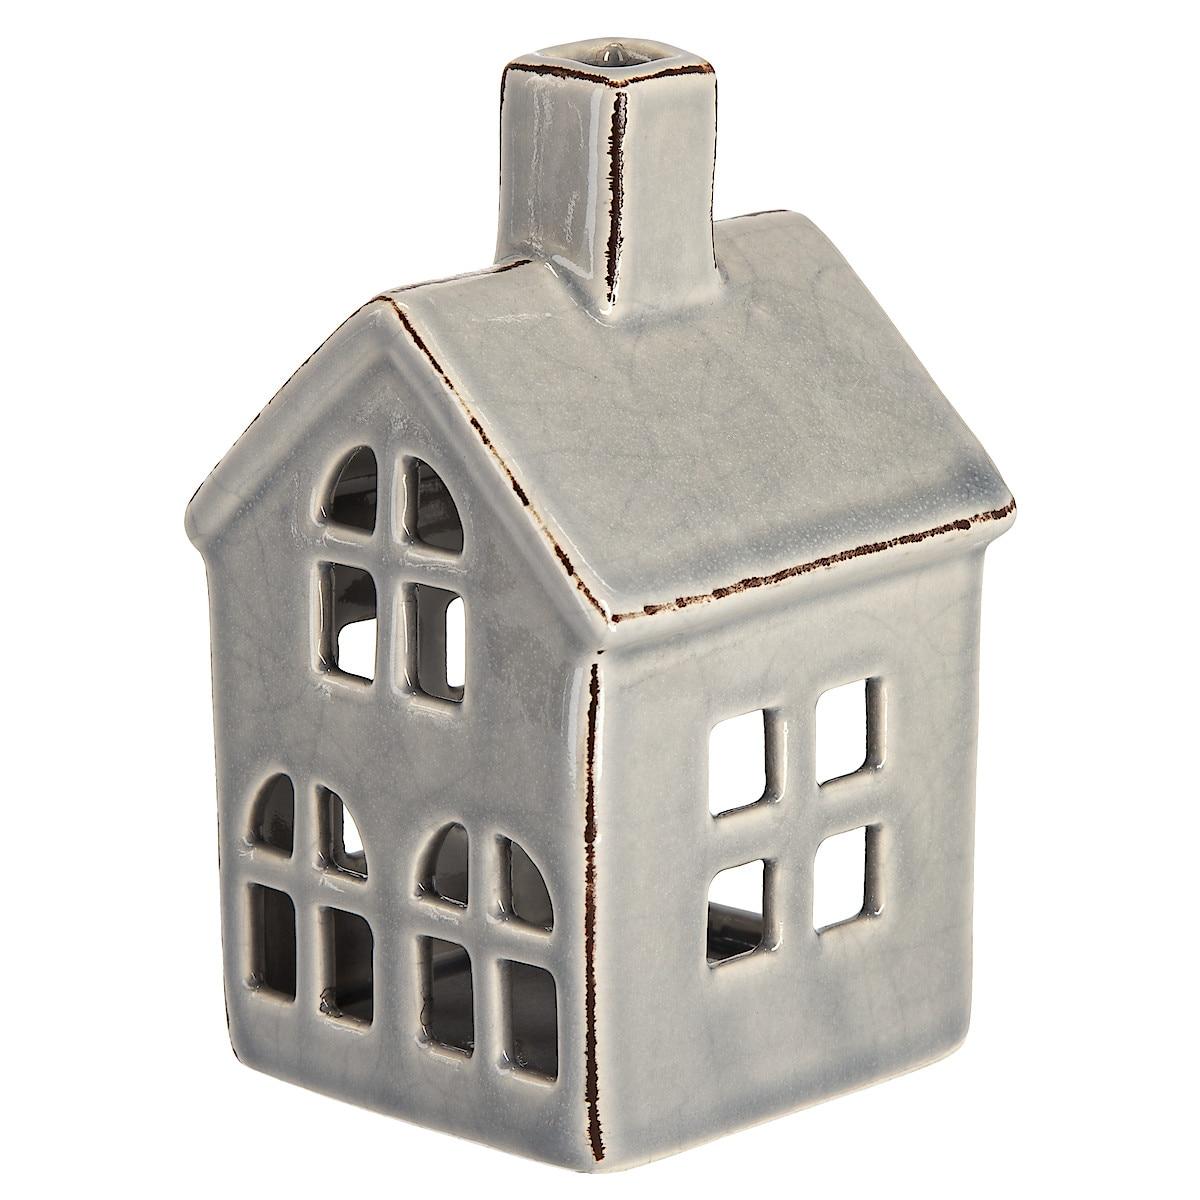 Lyhty talo